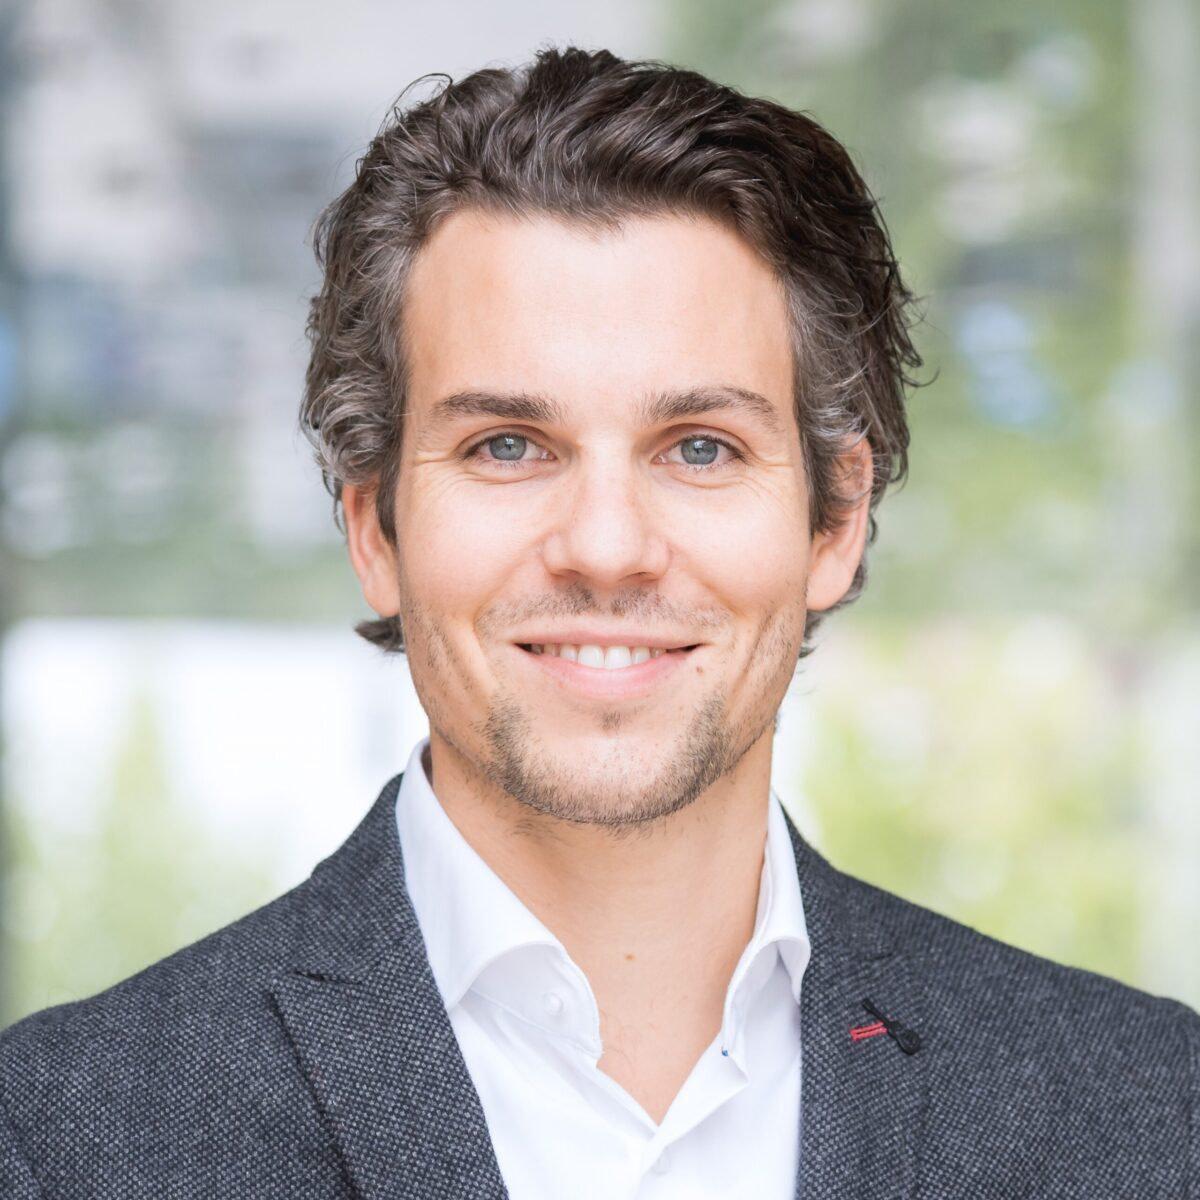 Philipp Spreer